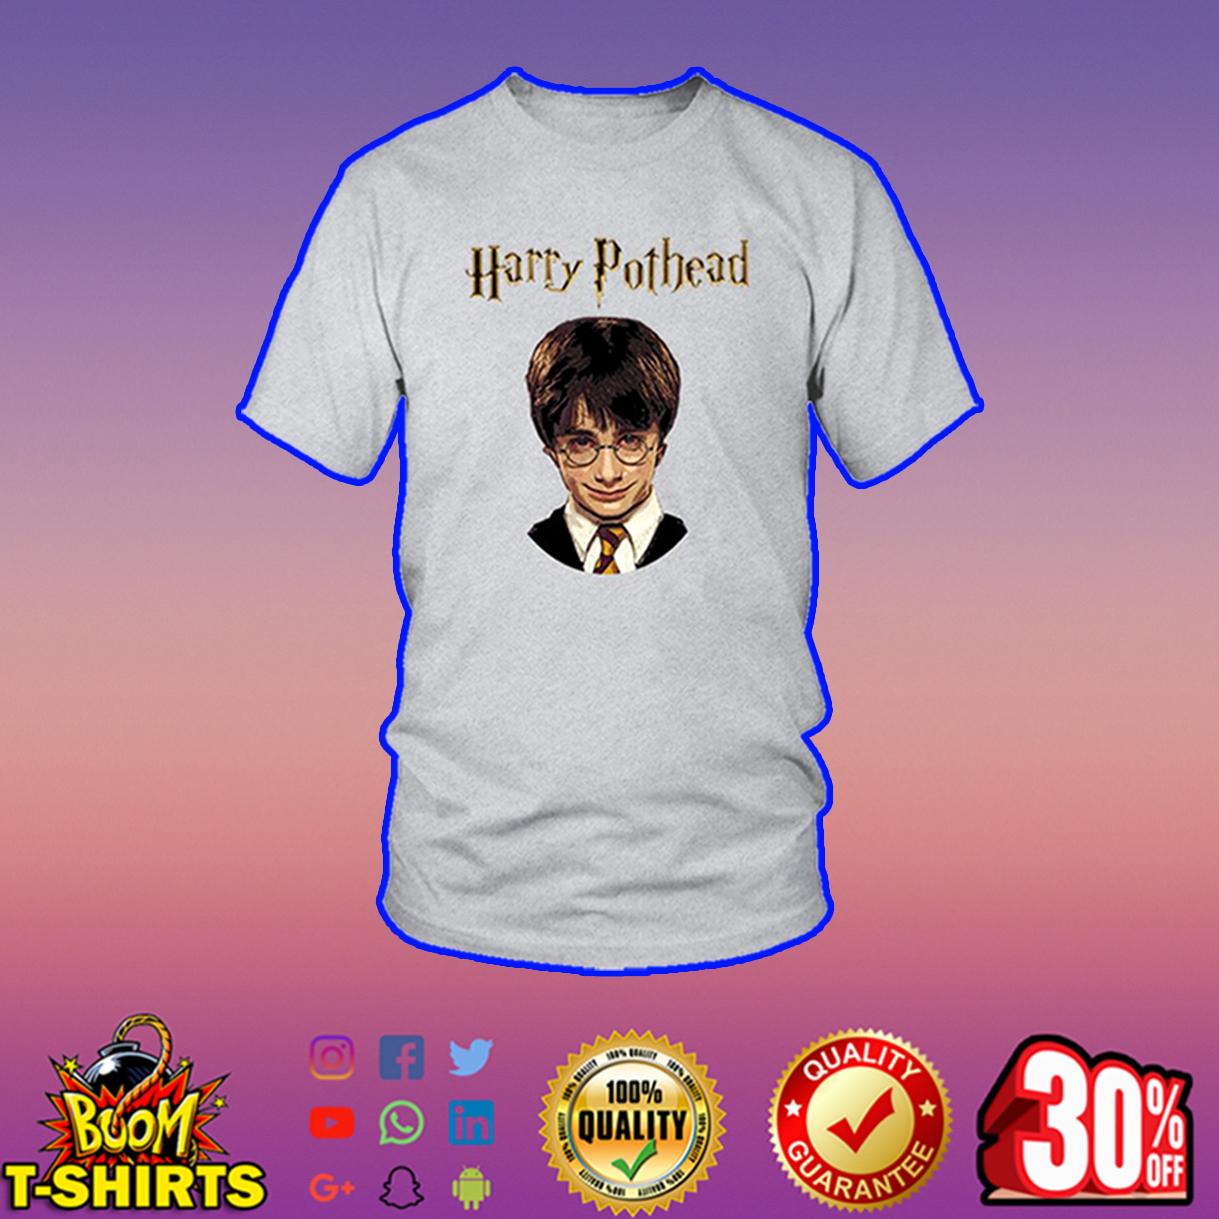 Harry Pothead t-shirt